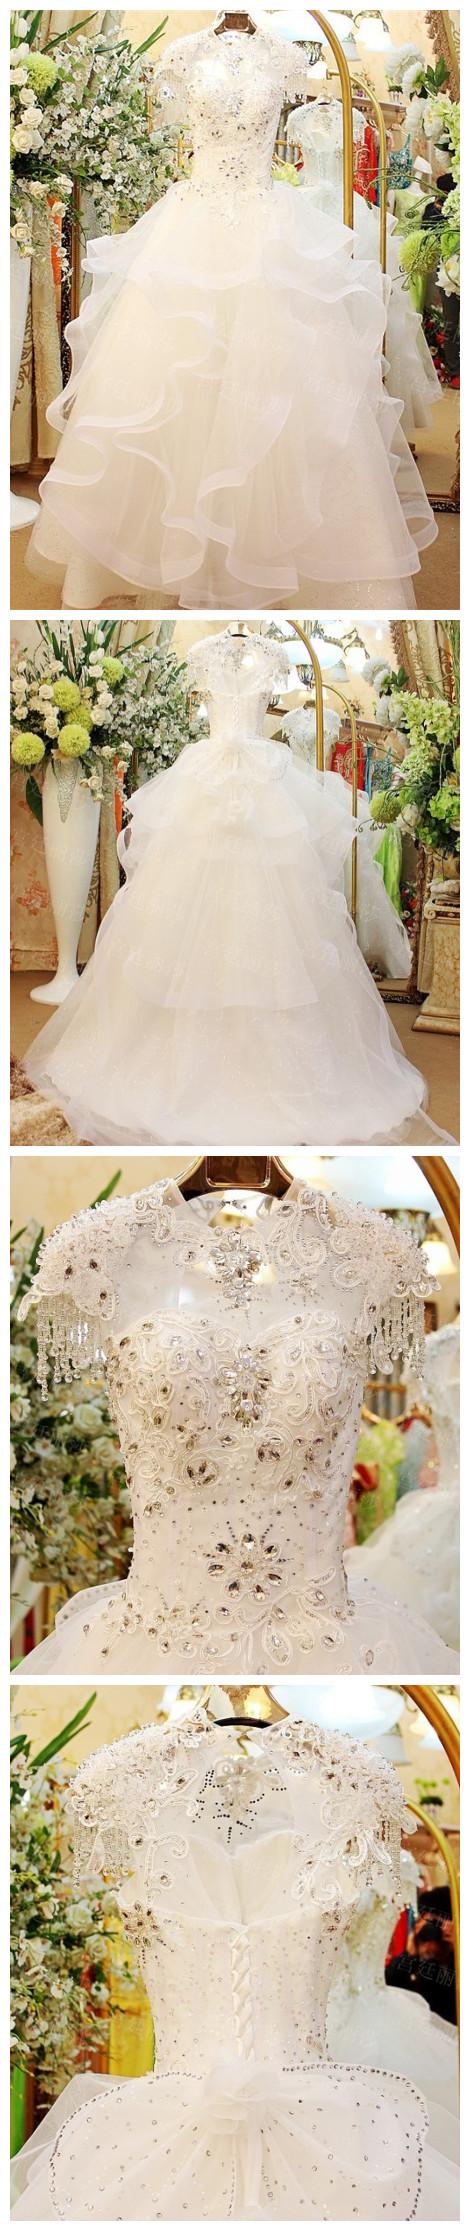 Rhinestone wedding dresses  Aline Shiny Scoop Neck Wedding DressesAppliqued Dresses For Autumn